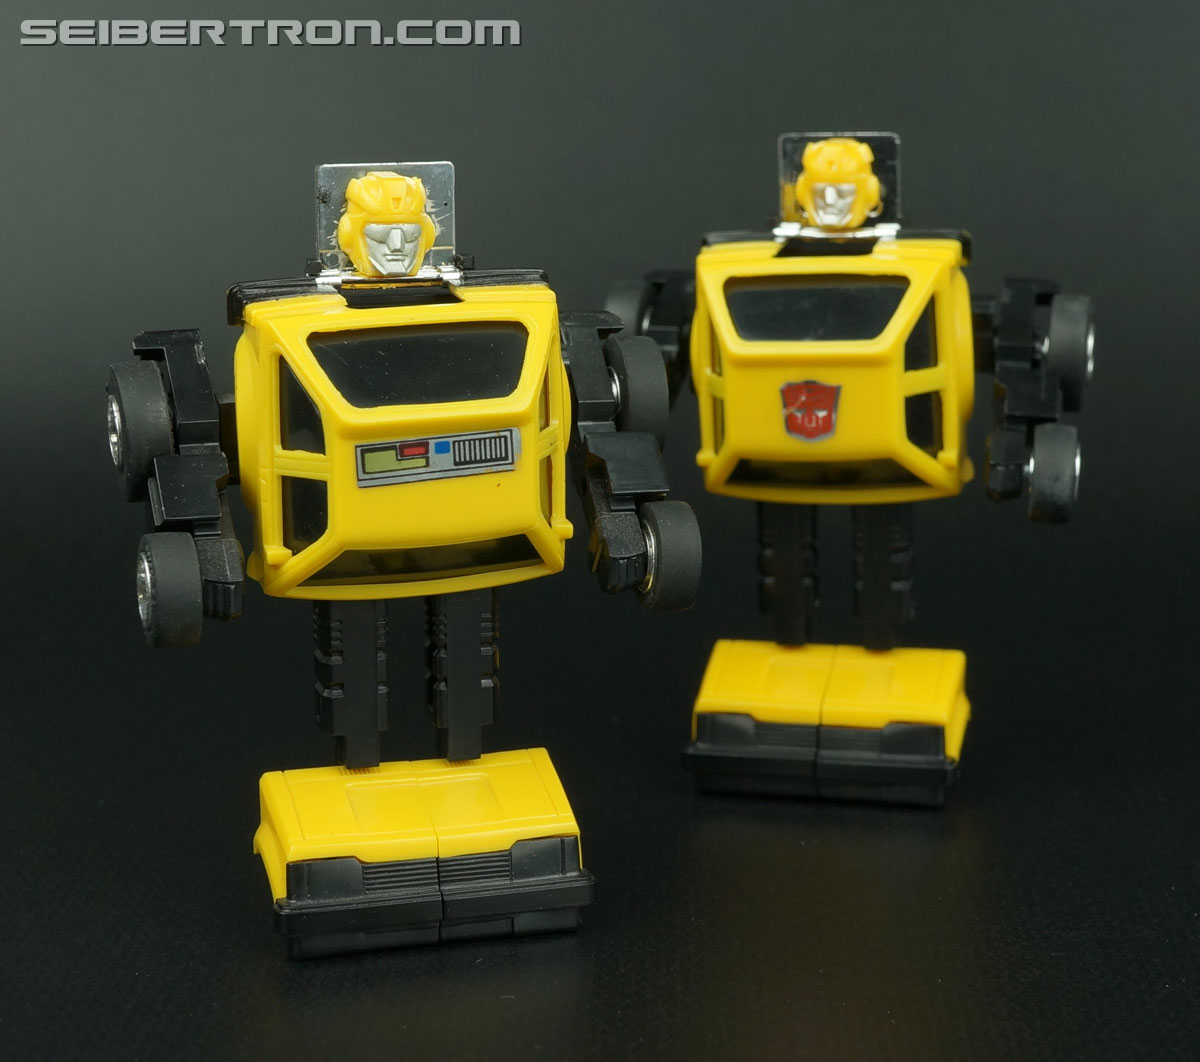 Transformers Micro Change MC04 Mini CAR Robo 02 XG1500 (Yellow) (Image #66 of 70)